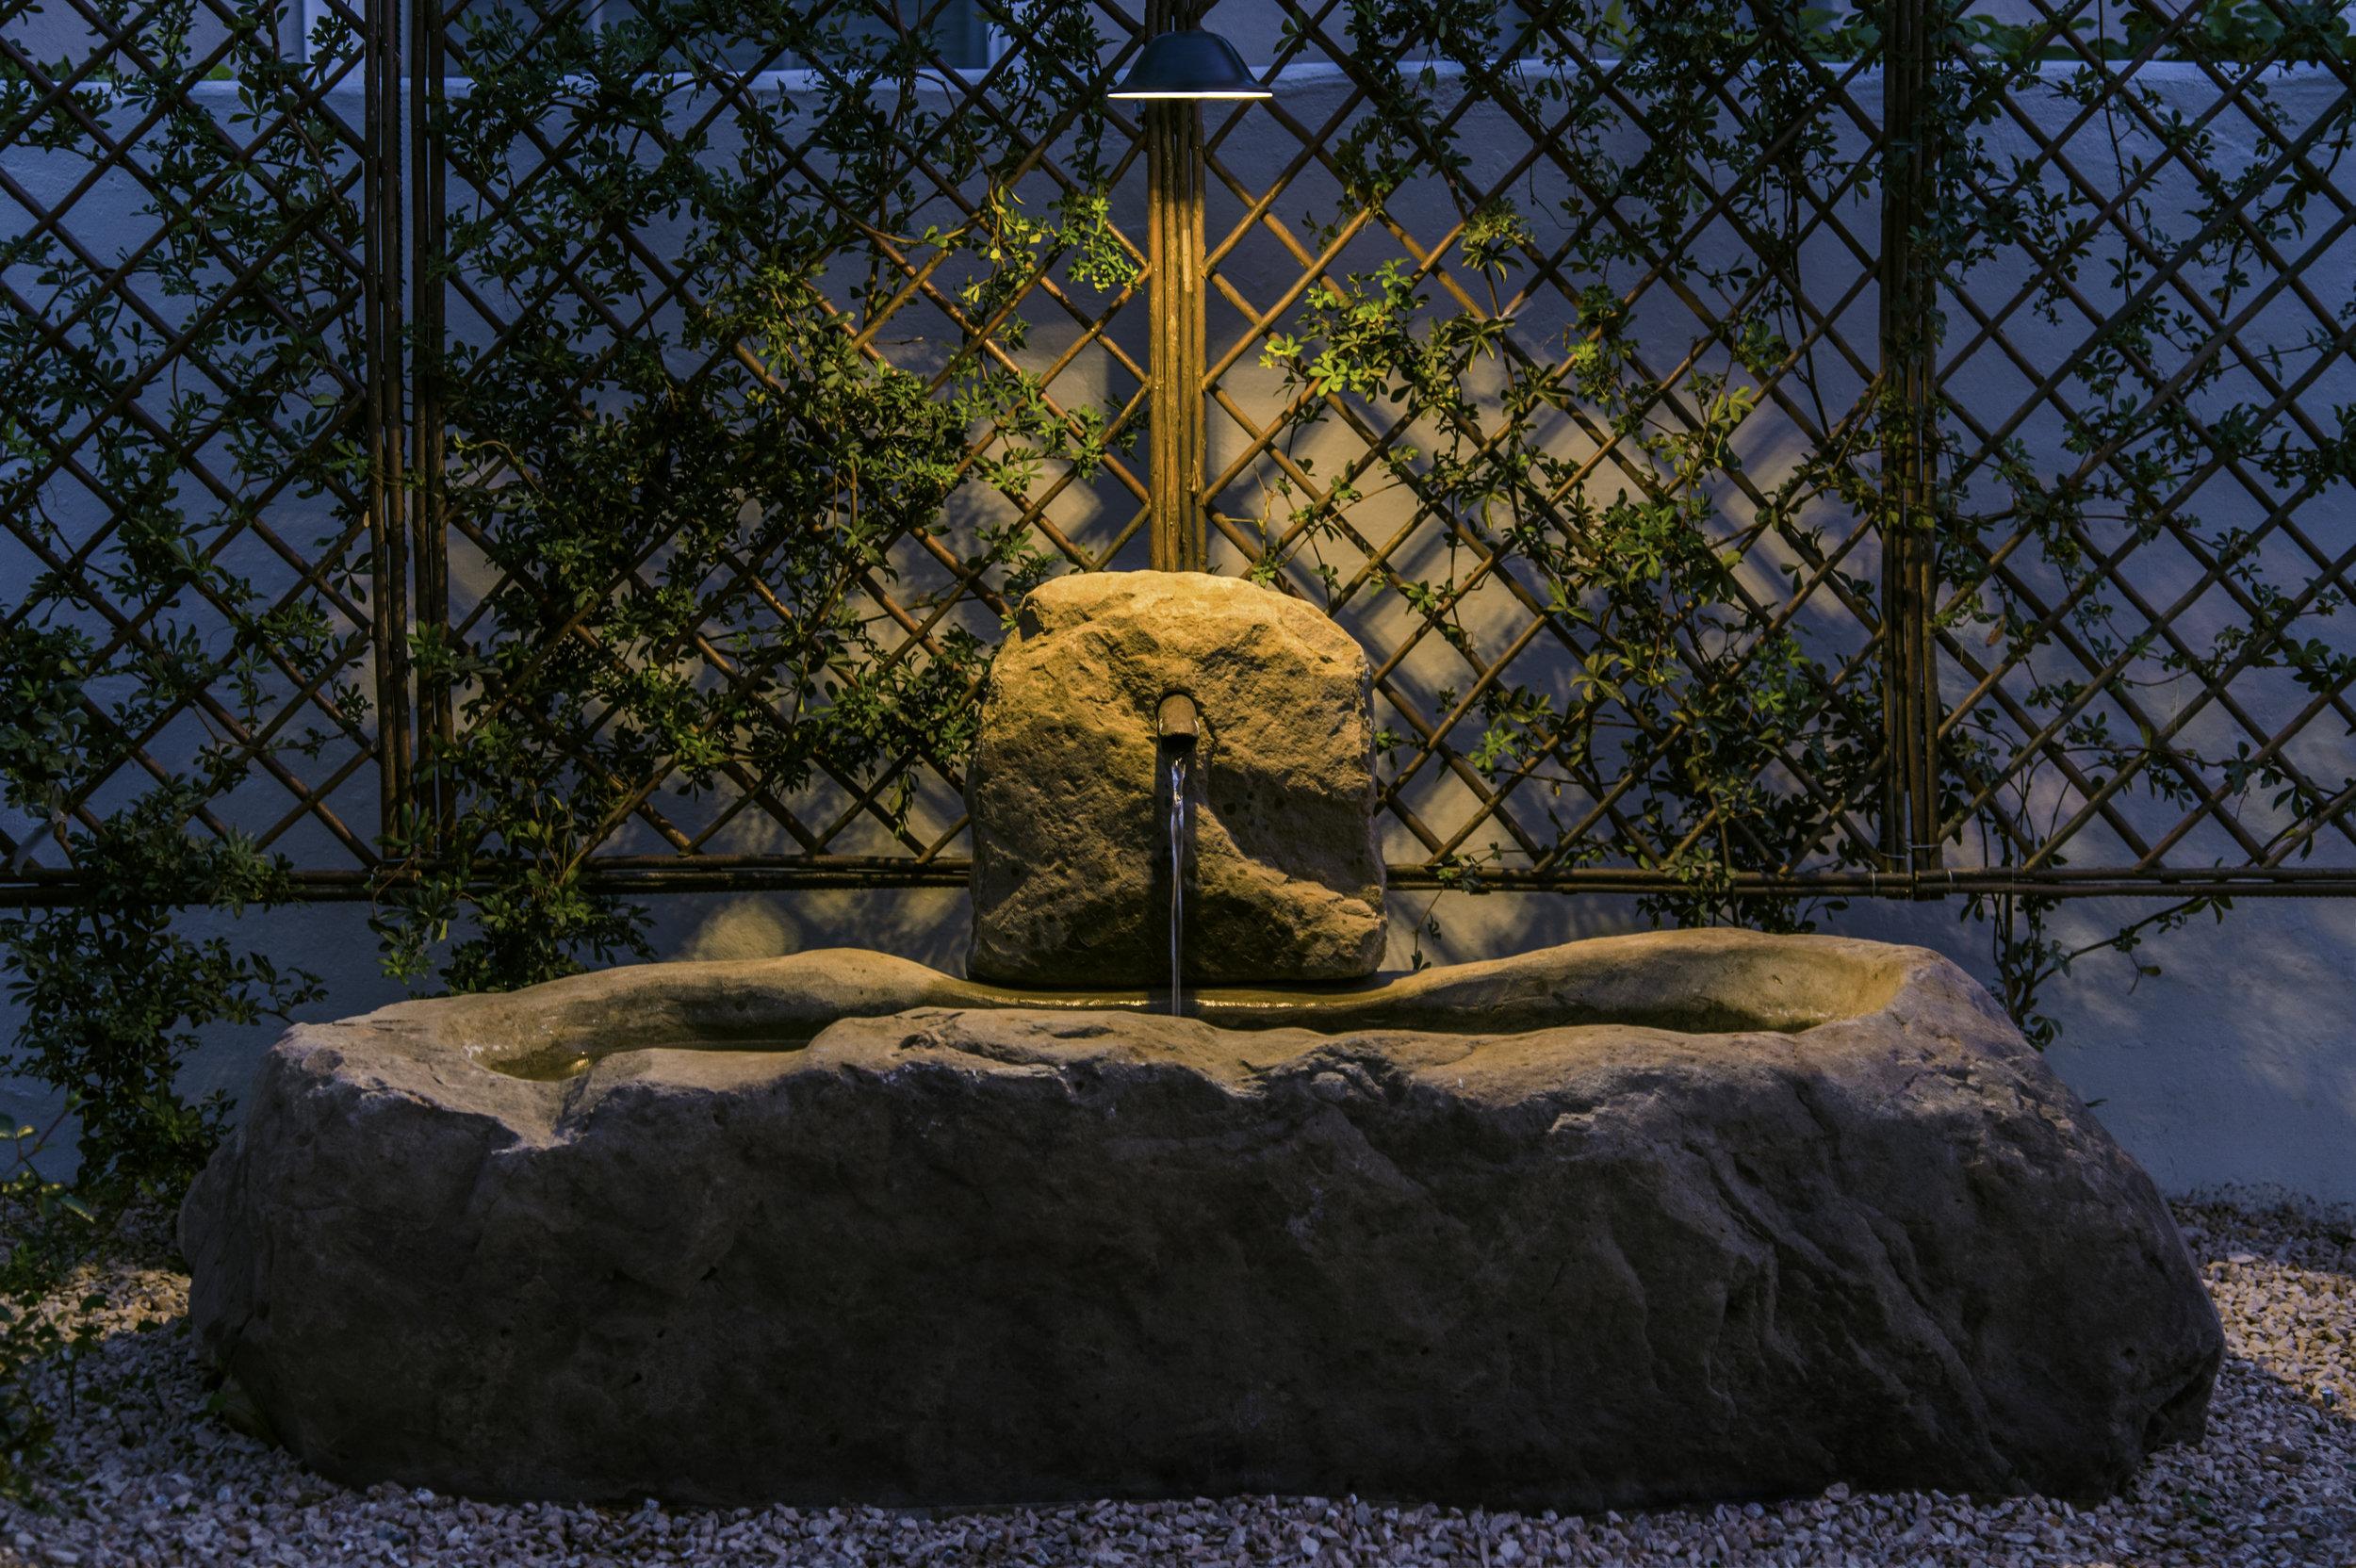 drought tolerant landscape with stone fountain